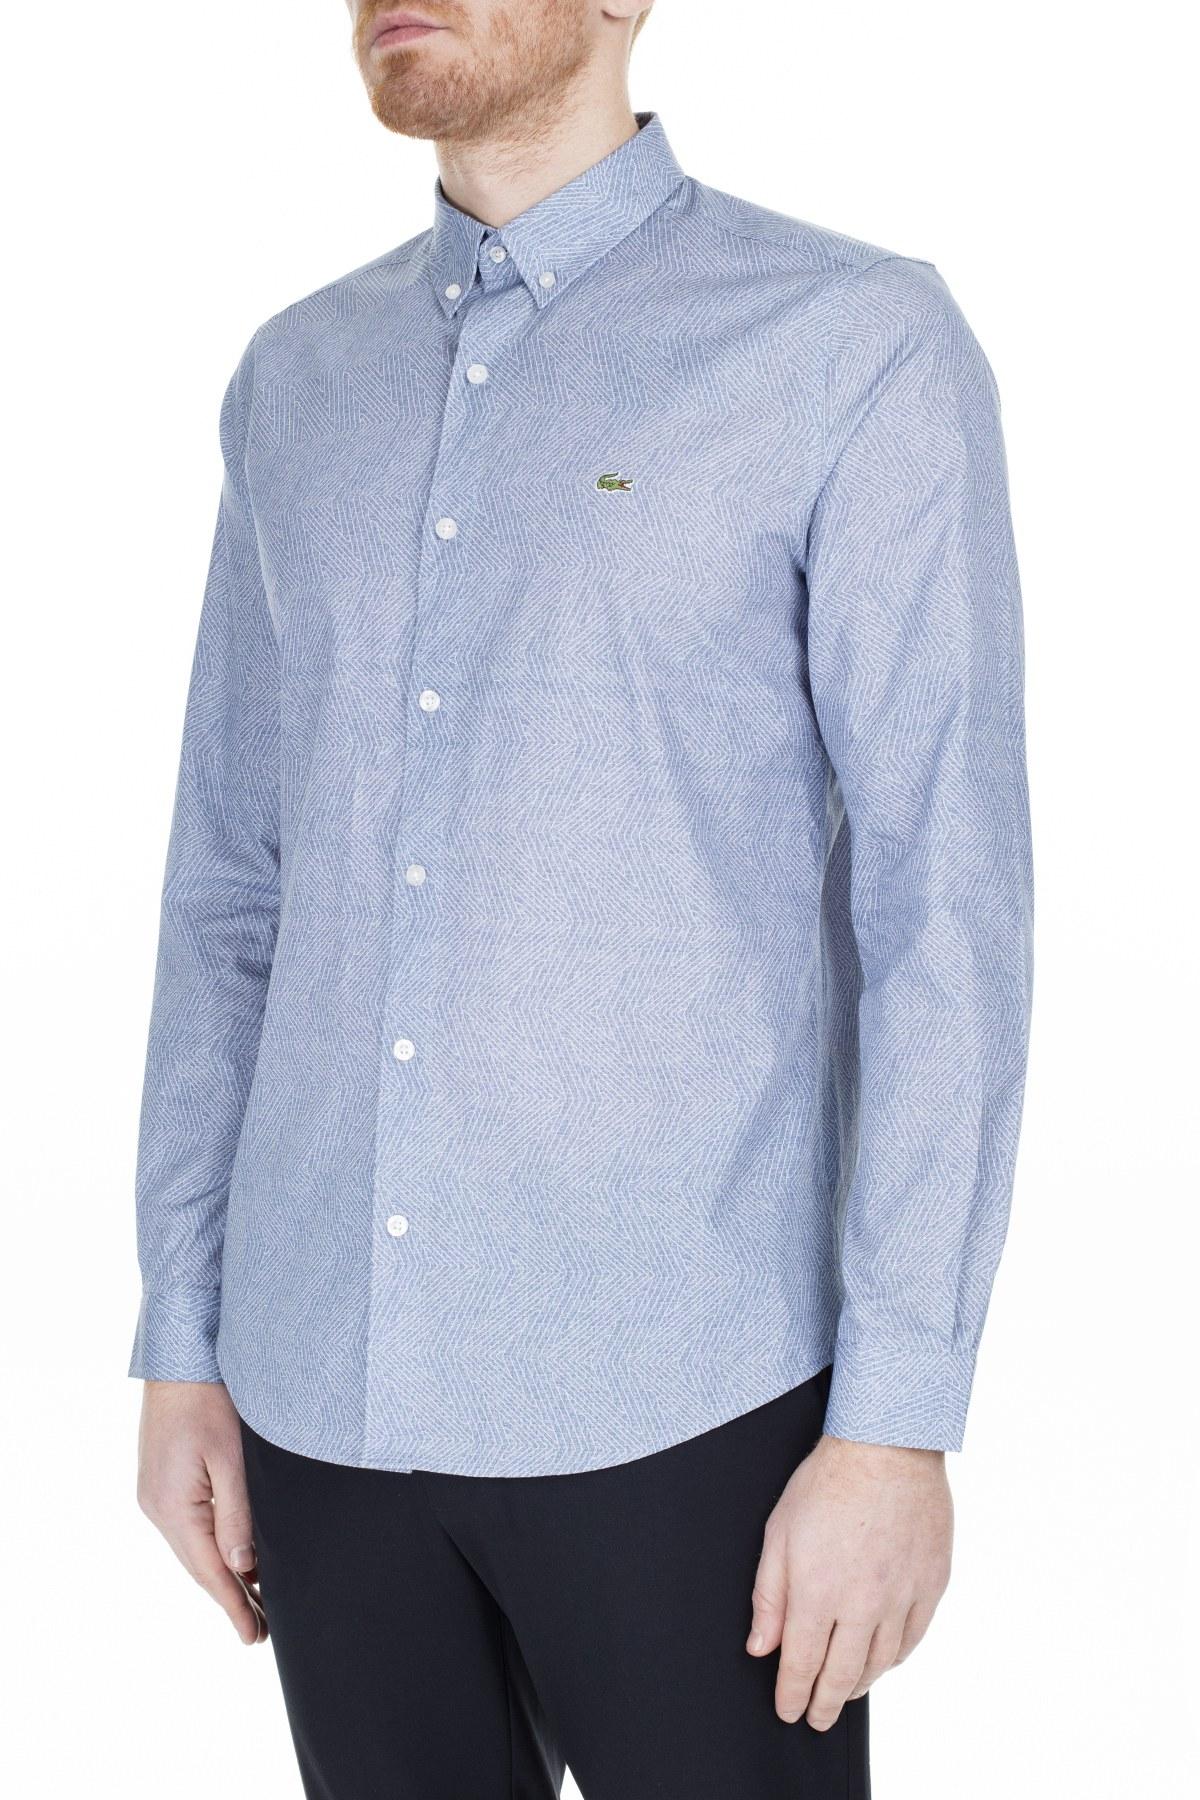 Lacoste Slim Fit Erkek Gömlek CH0057T 57M